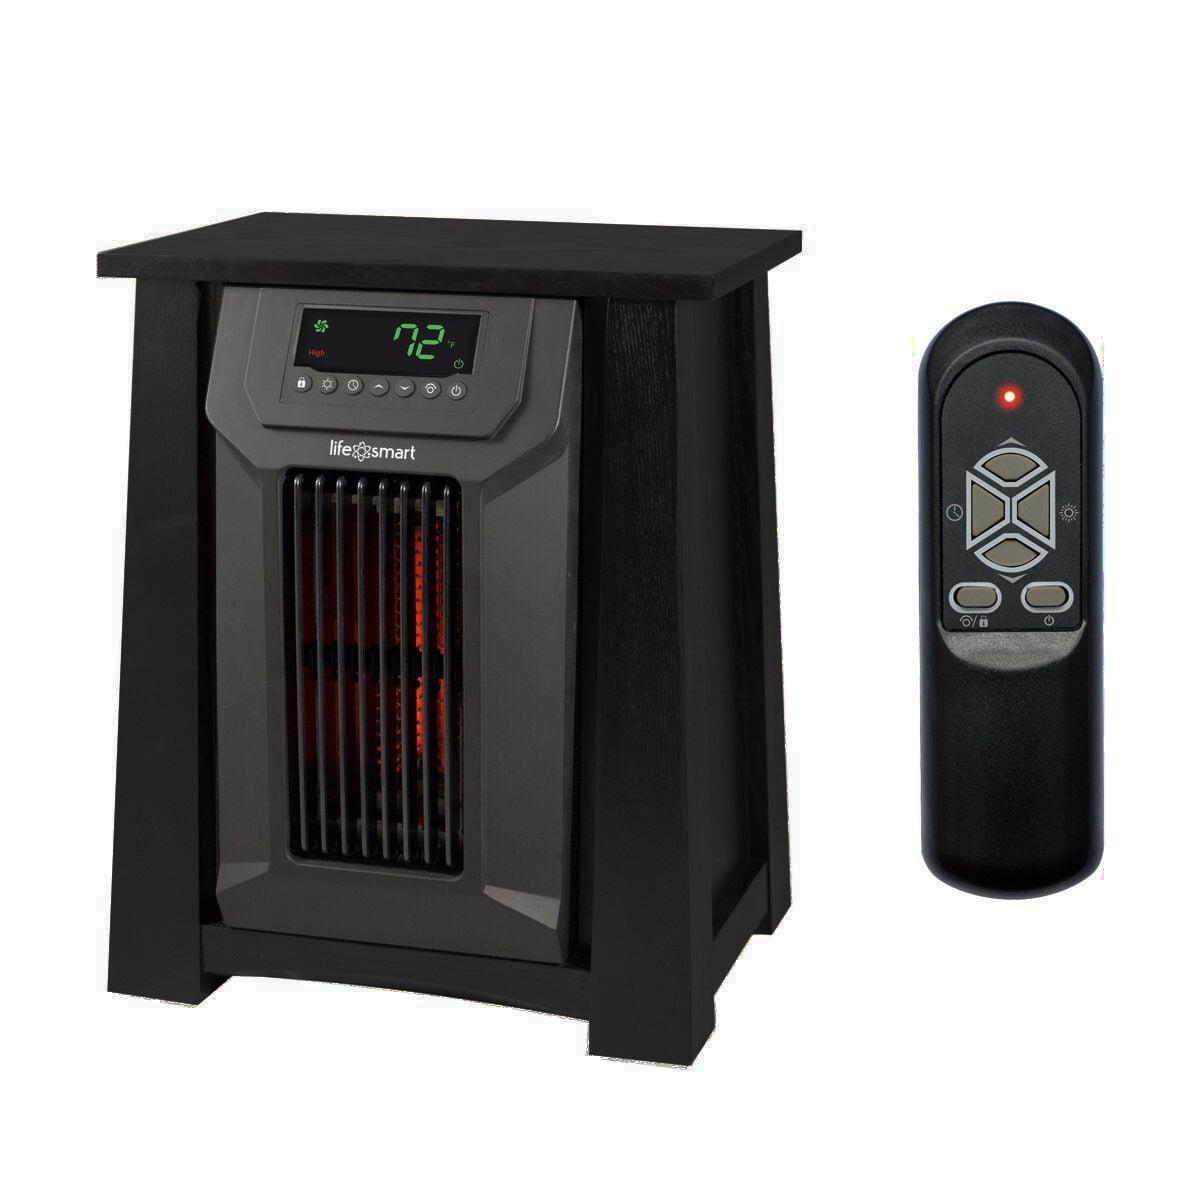 Lifesmart 8 Element Portable Infrared 6 Quartz 2 Mica Space Heater w/ 3 Settings